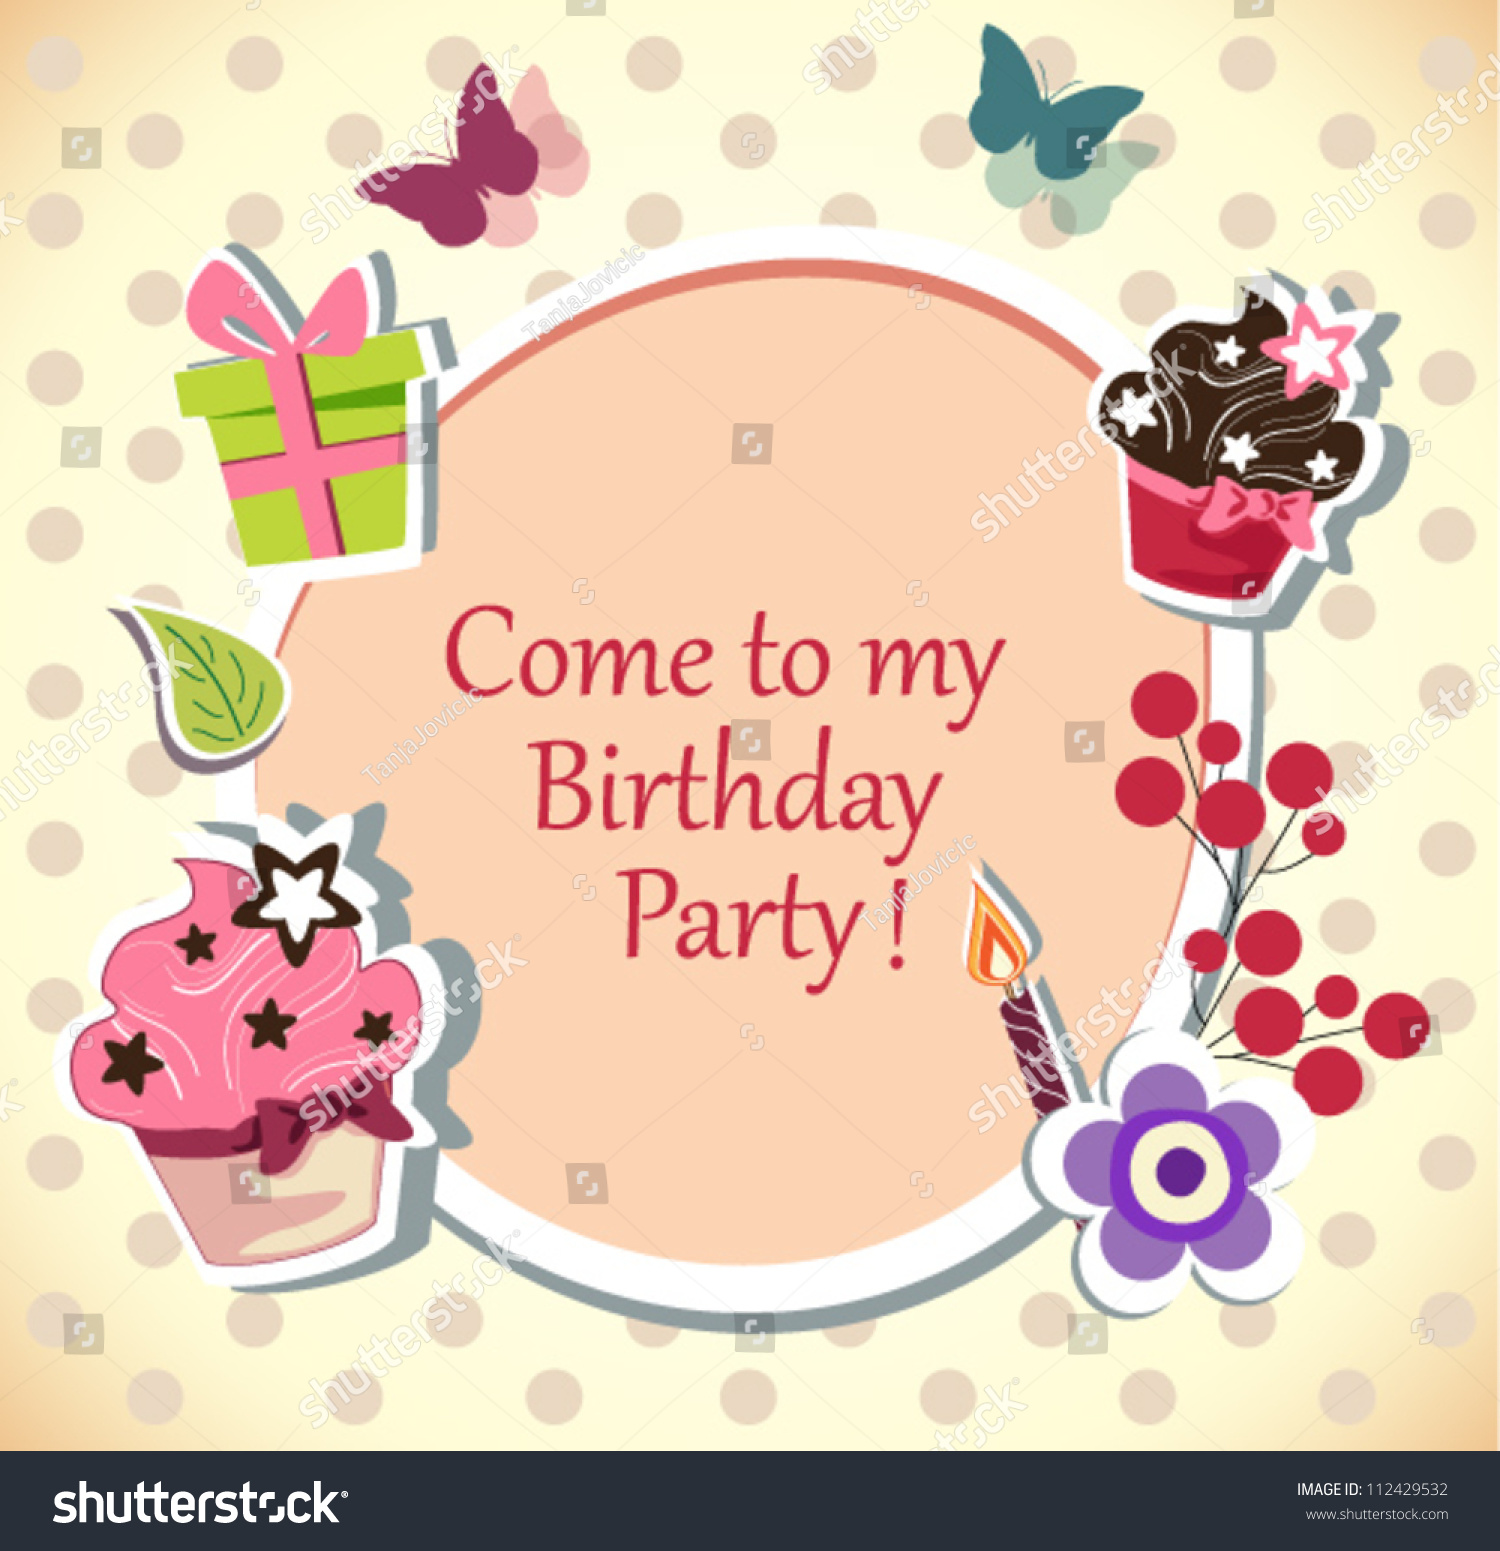 Birthday Party Invitation Card Stock Vector 112429532 - Shutterstock